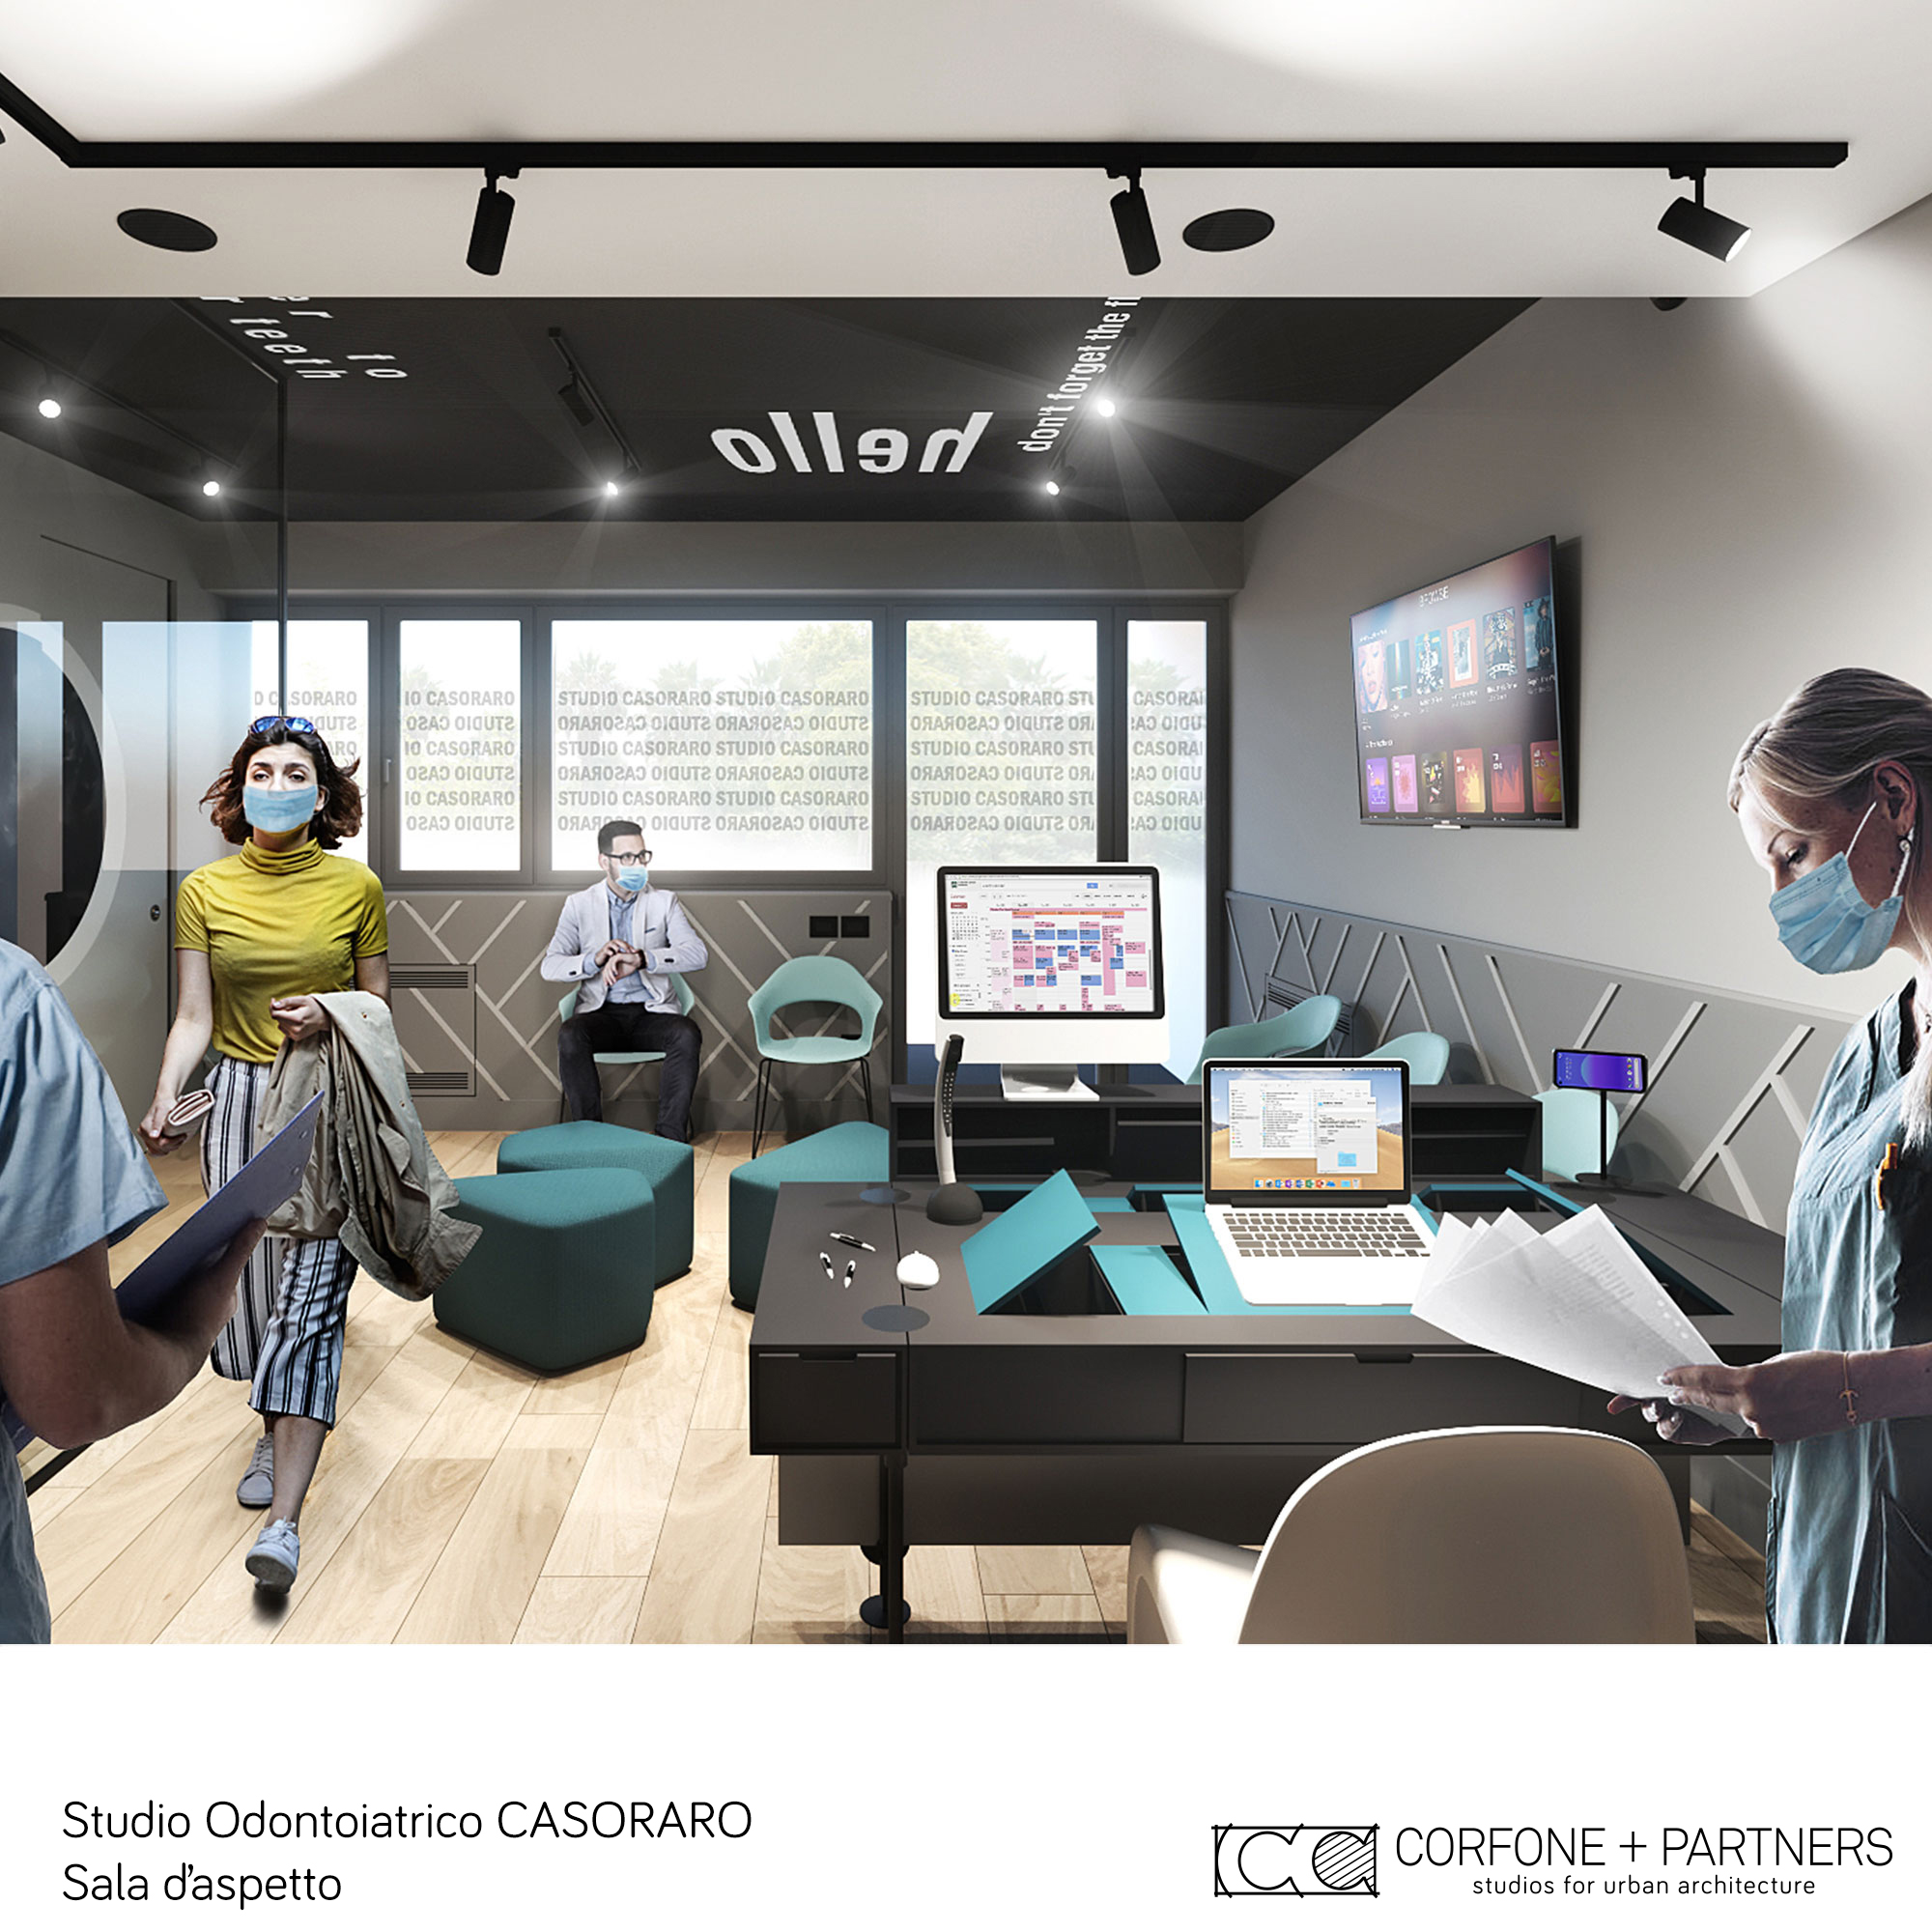 Progetto-Studio-Odontoiatrico-CASORARO-Pescara - 05